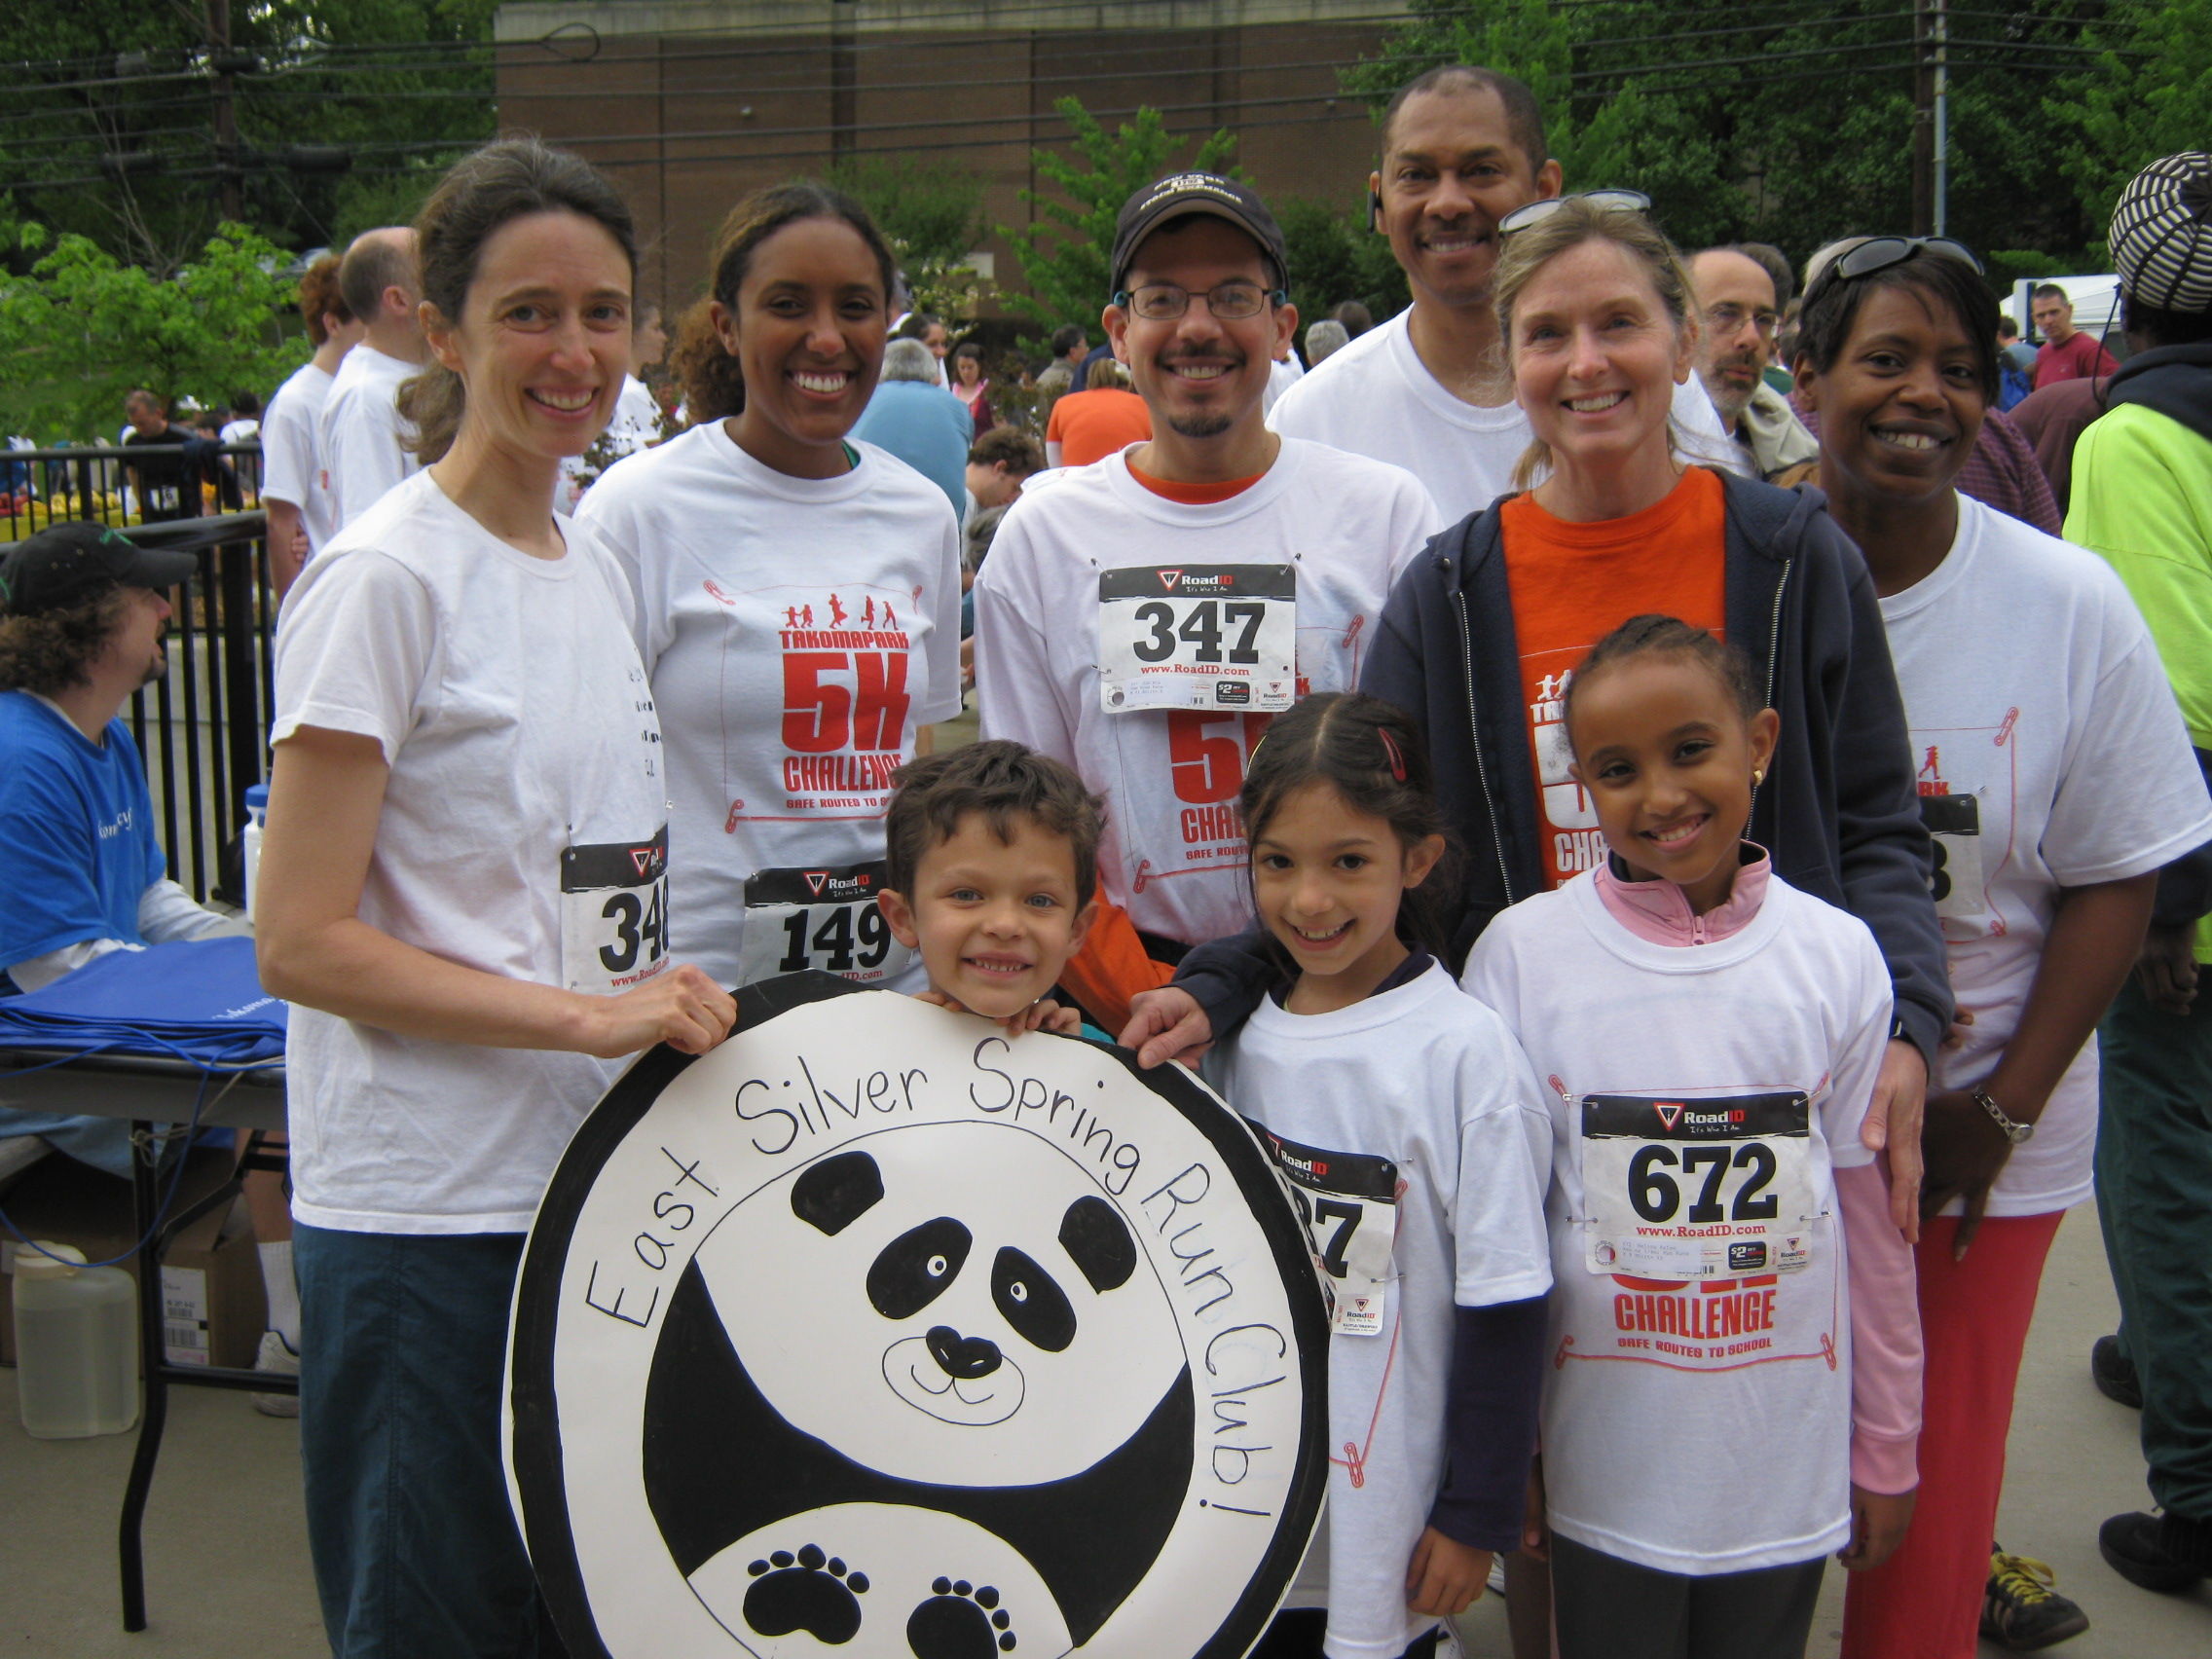 East Silver Spring ES Run club represents!